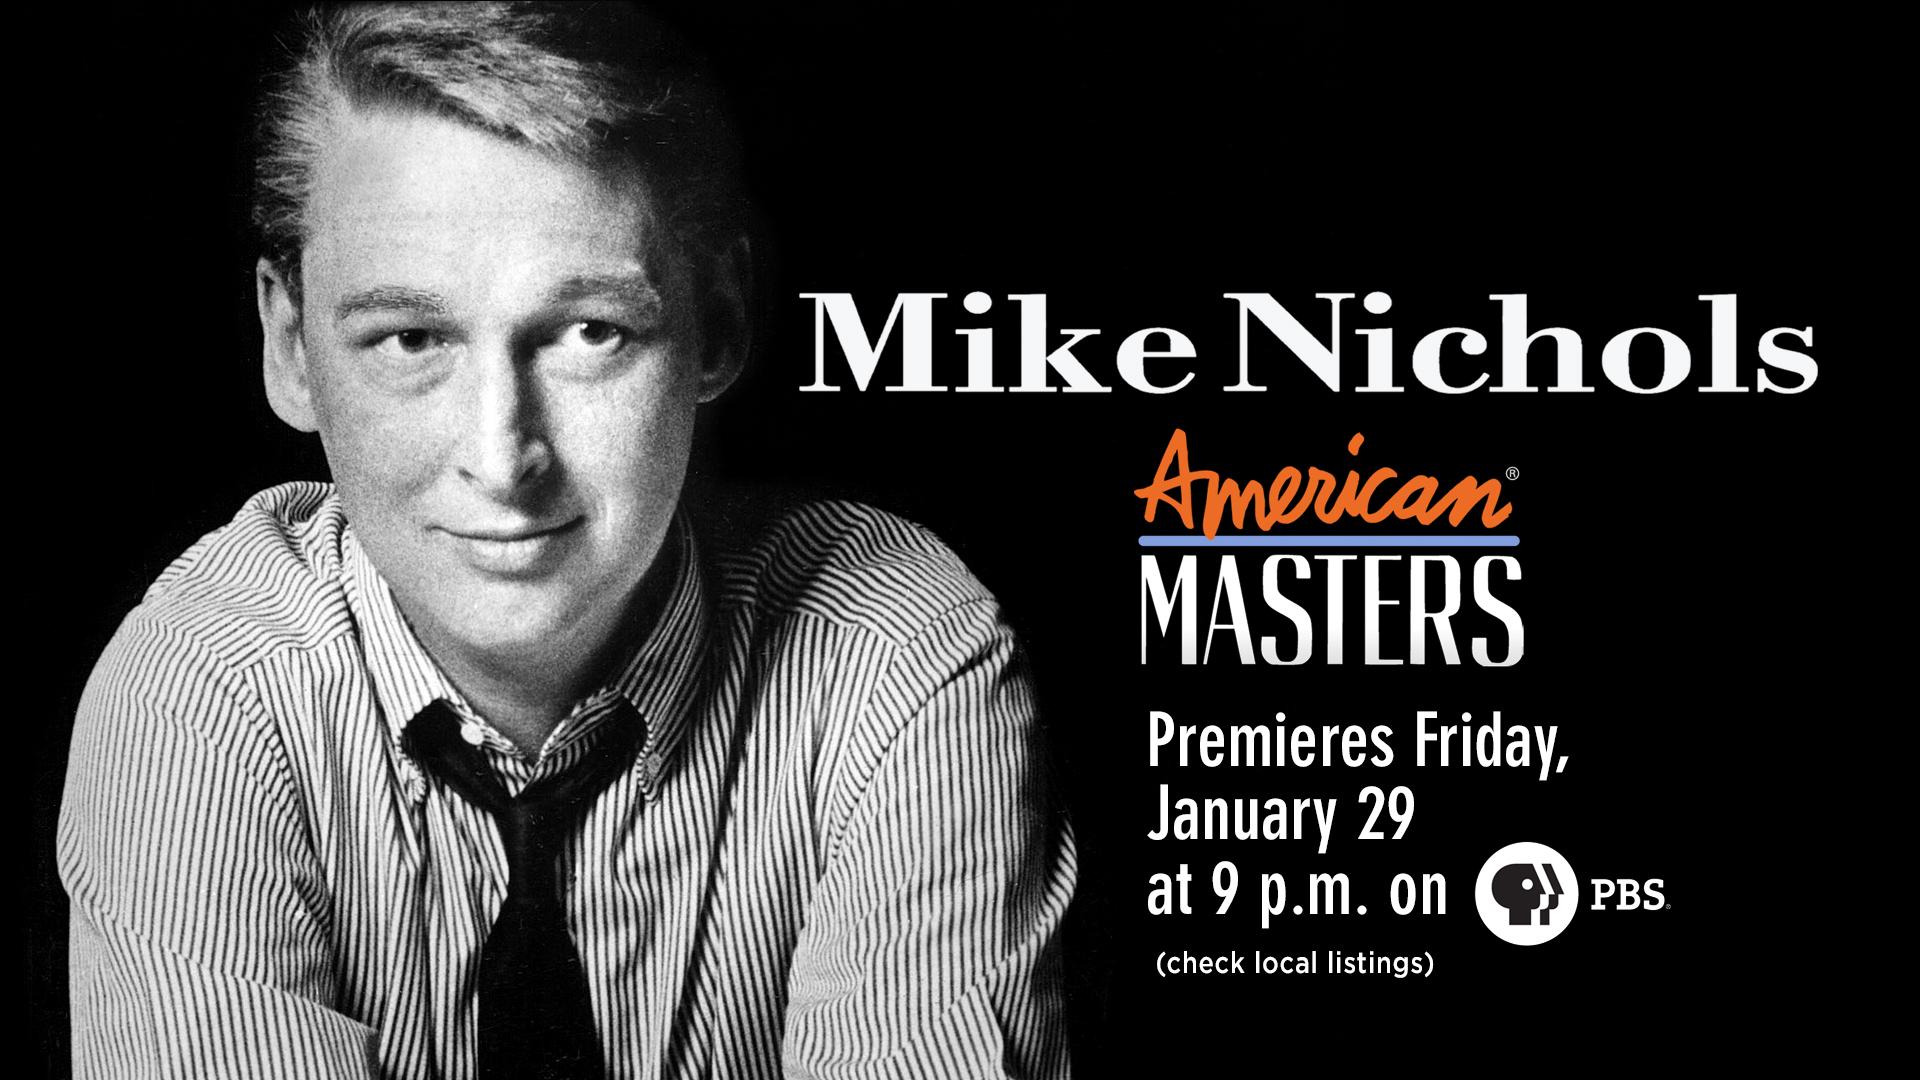 Mike Nichols Documentary American Masters